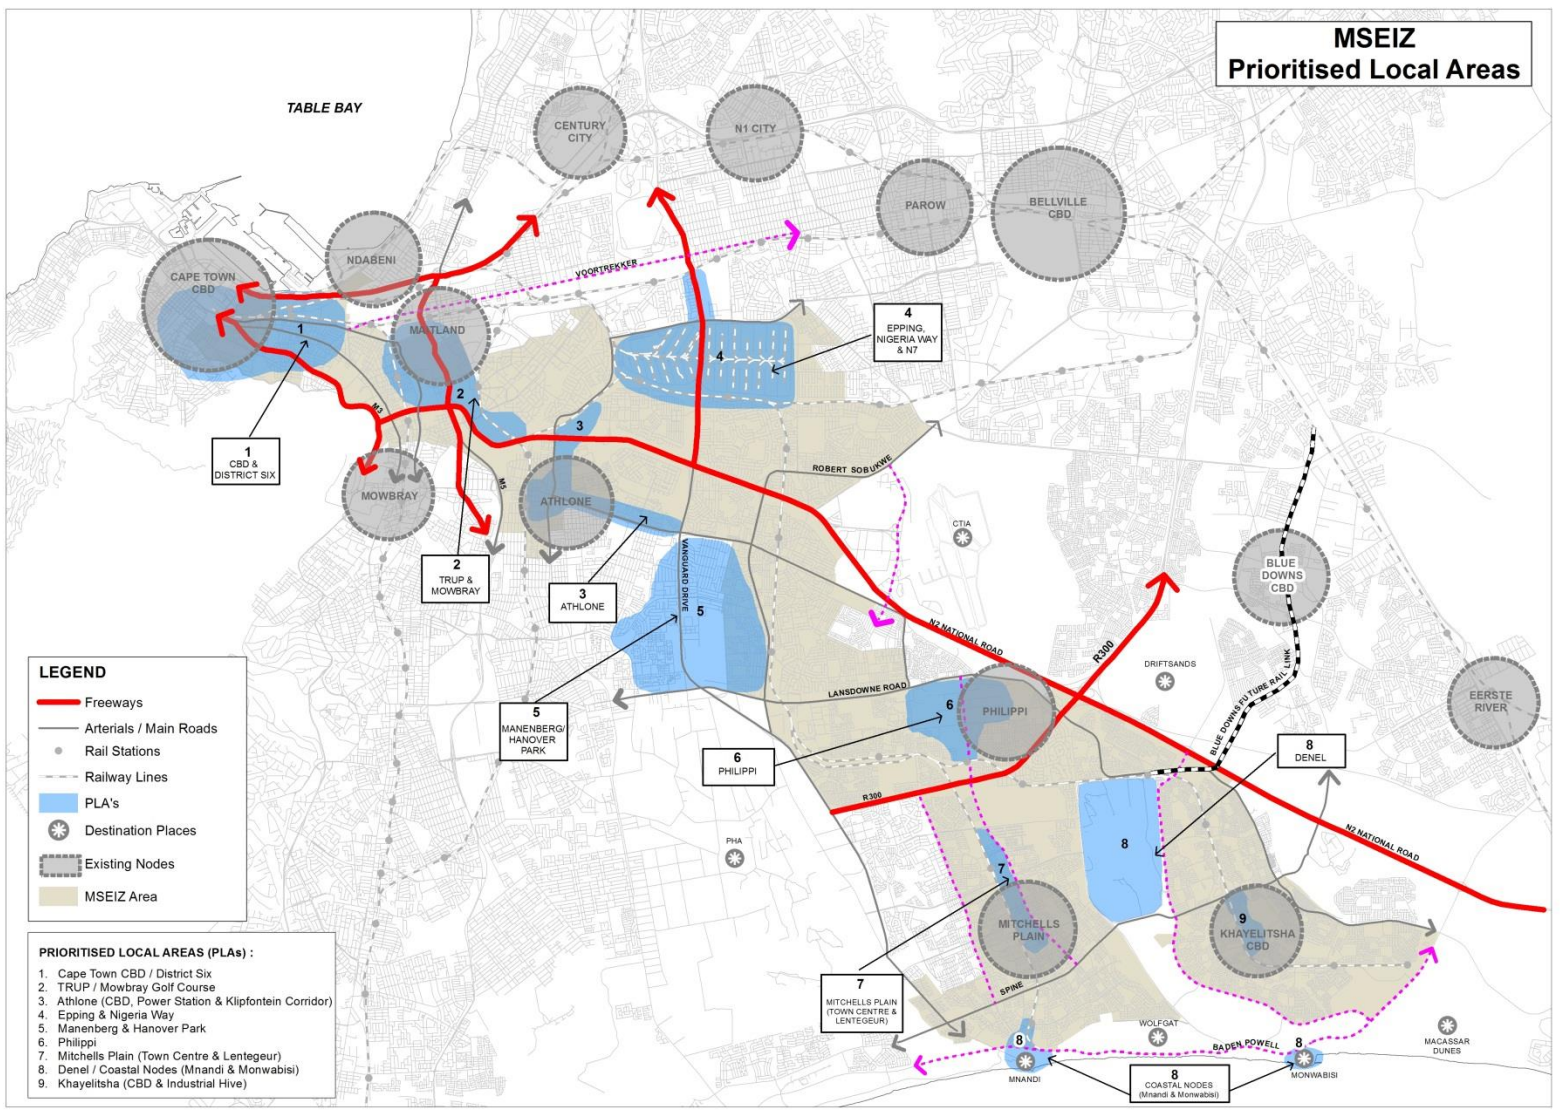 Metropolitan South East (MSE) Corridor. Credit: Built Environment Performance Plan, City of Cape Town